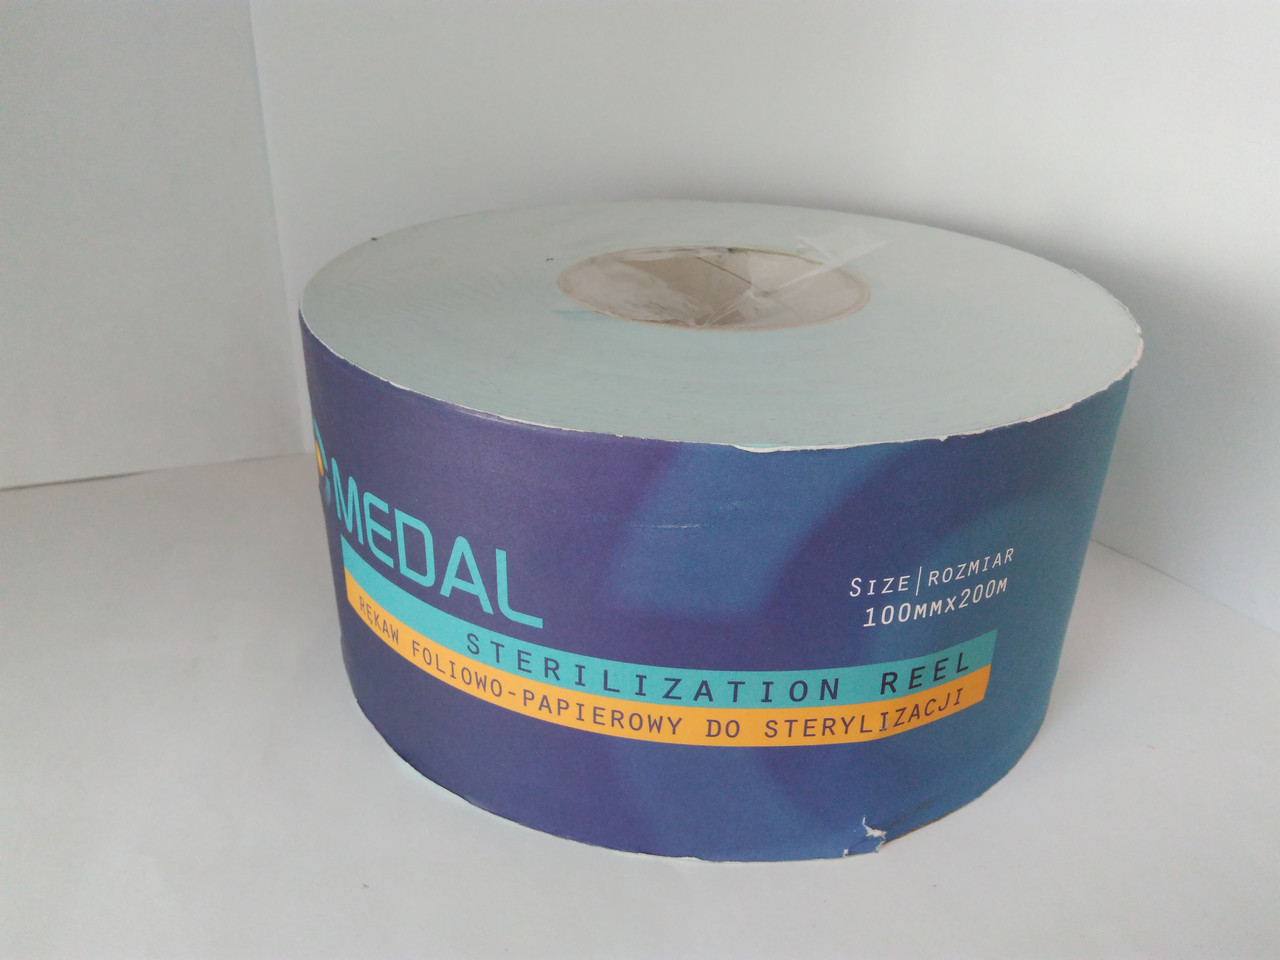 Рулоны для стерилизации 10 см х 200 м MEDAL